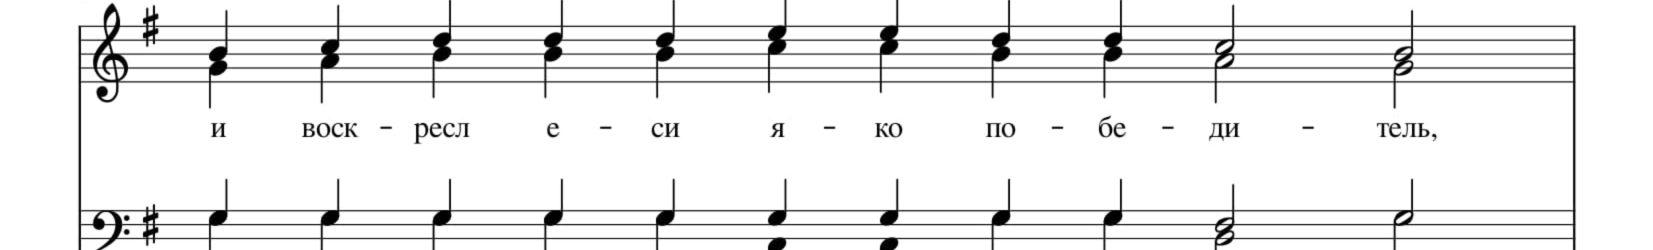 Кондак Пасхи, 8 глас. Валаамский распев